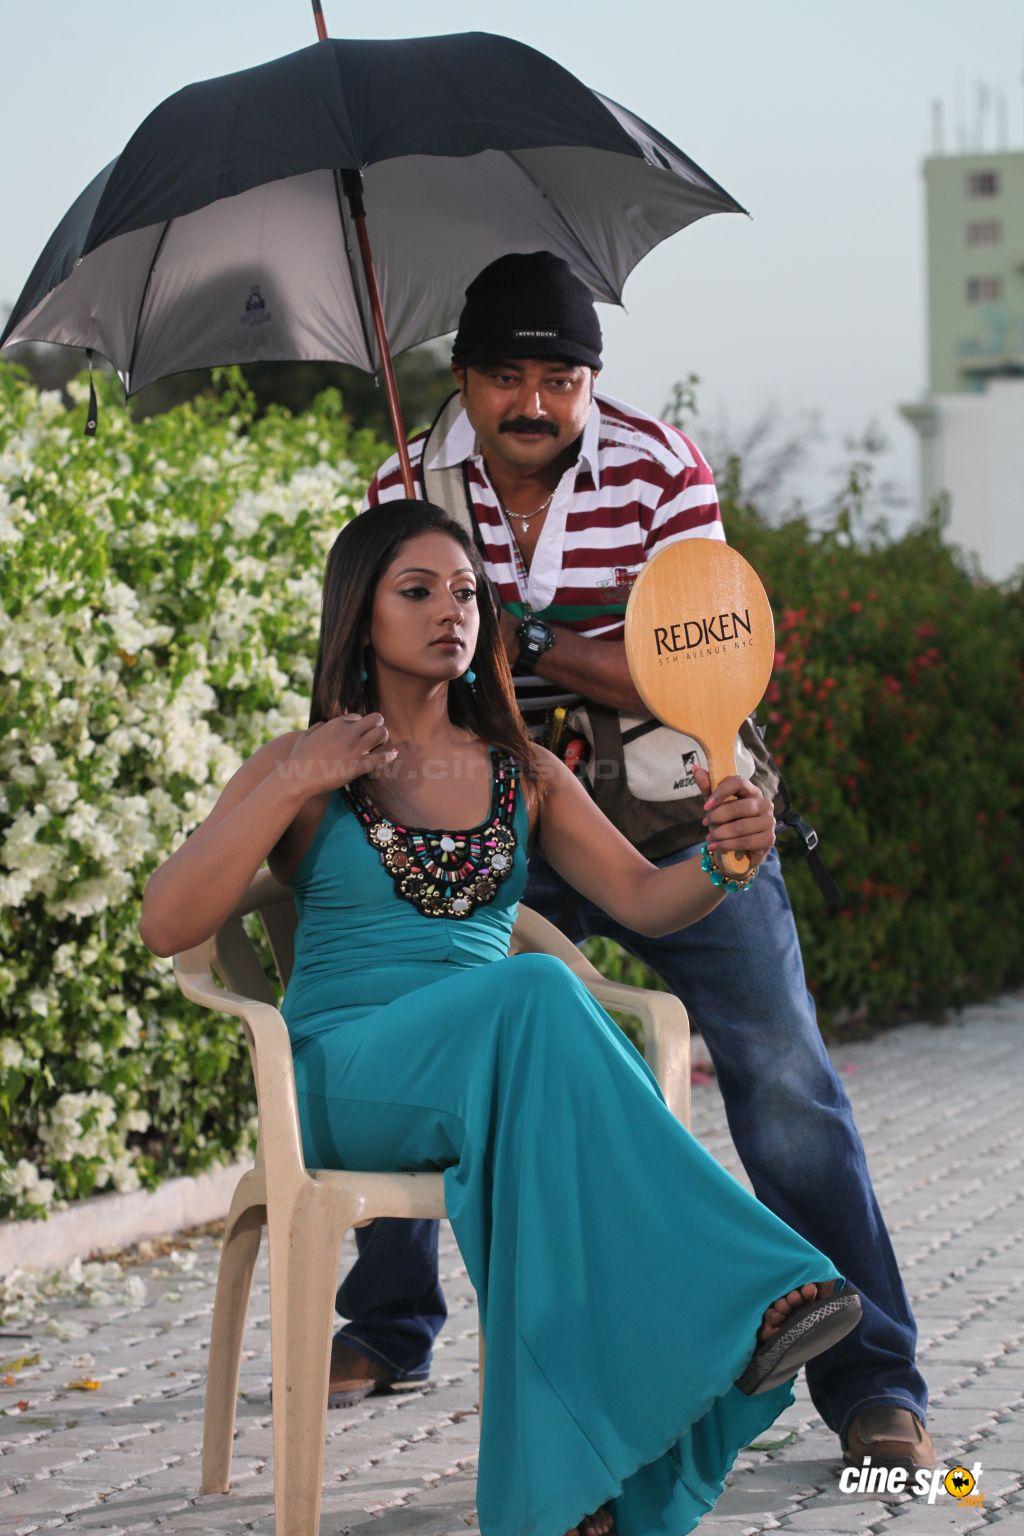 Sxx BLOG: Photos Sheela from Make up man malayalam movie